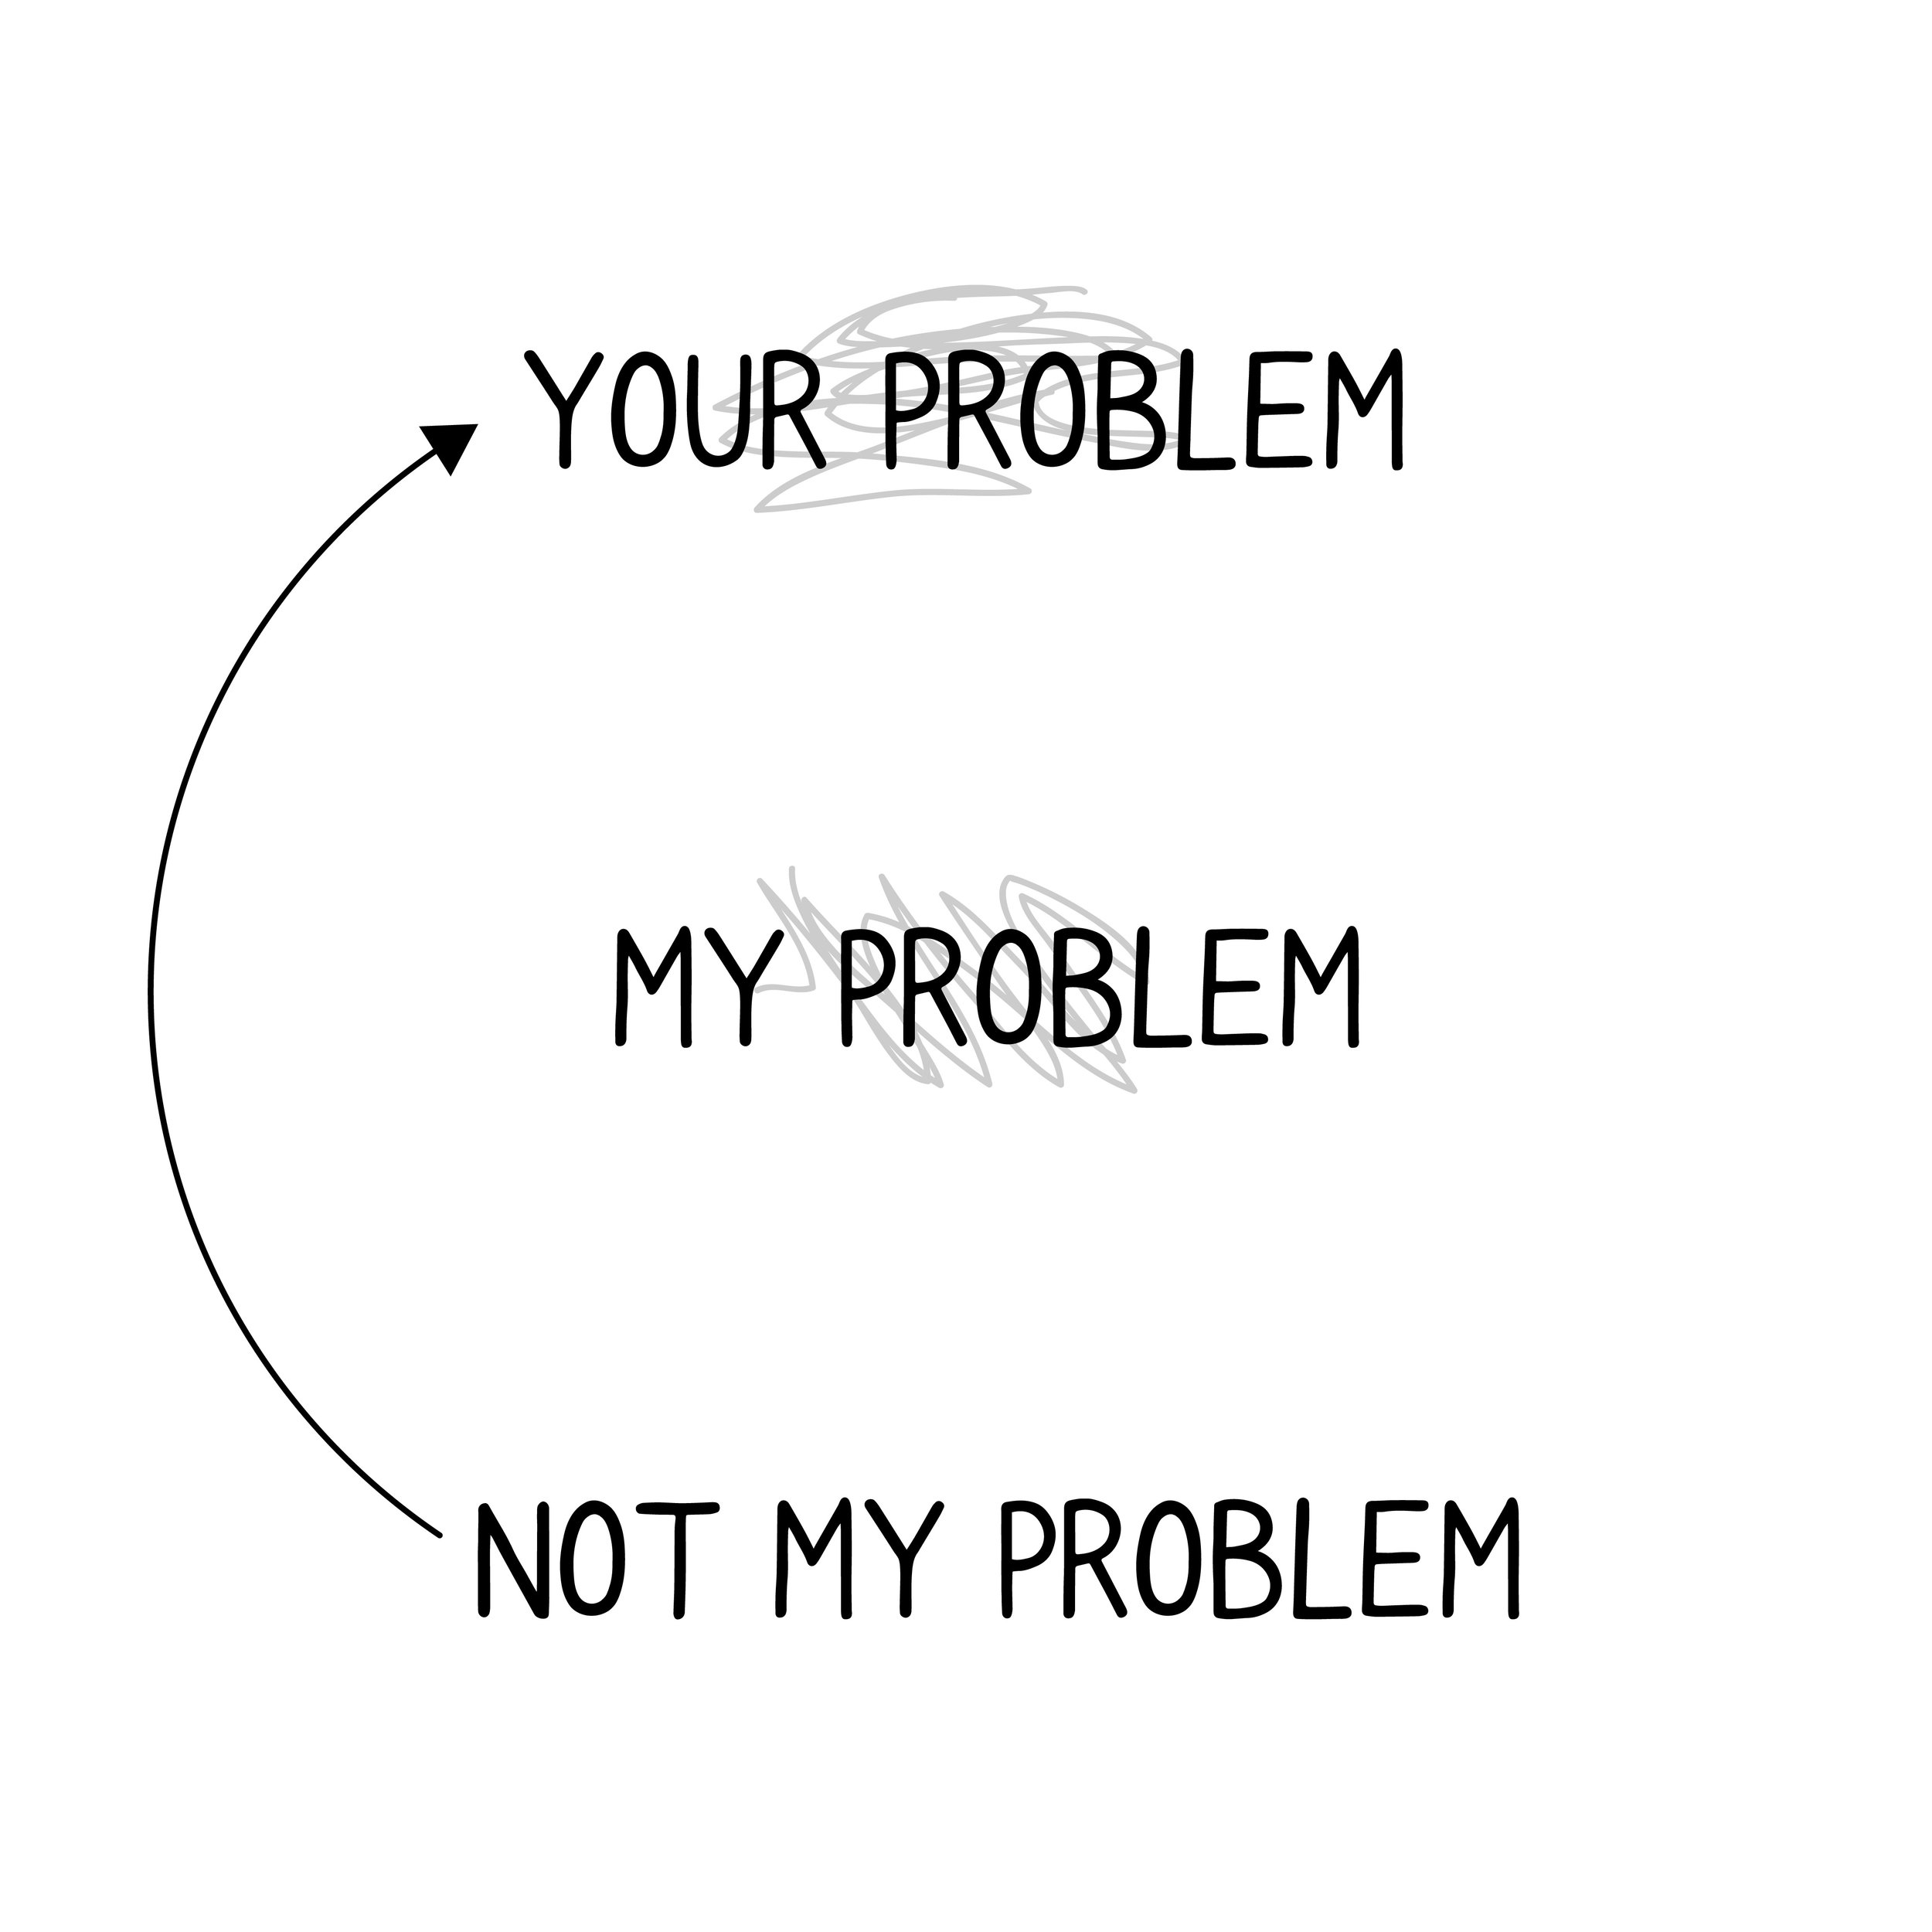 notmyproblem-01.jpg